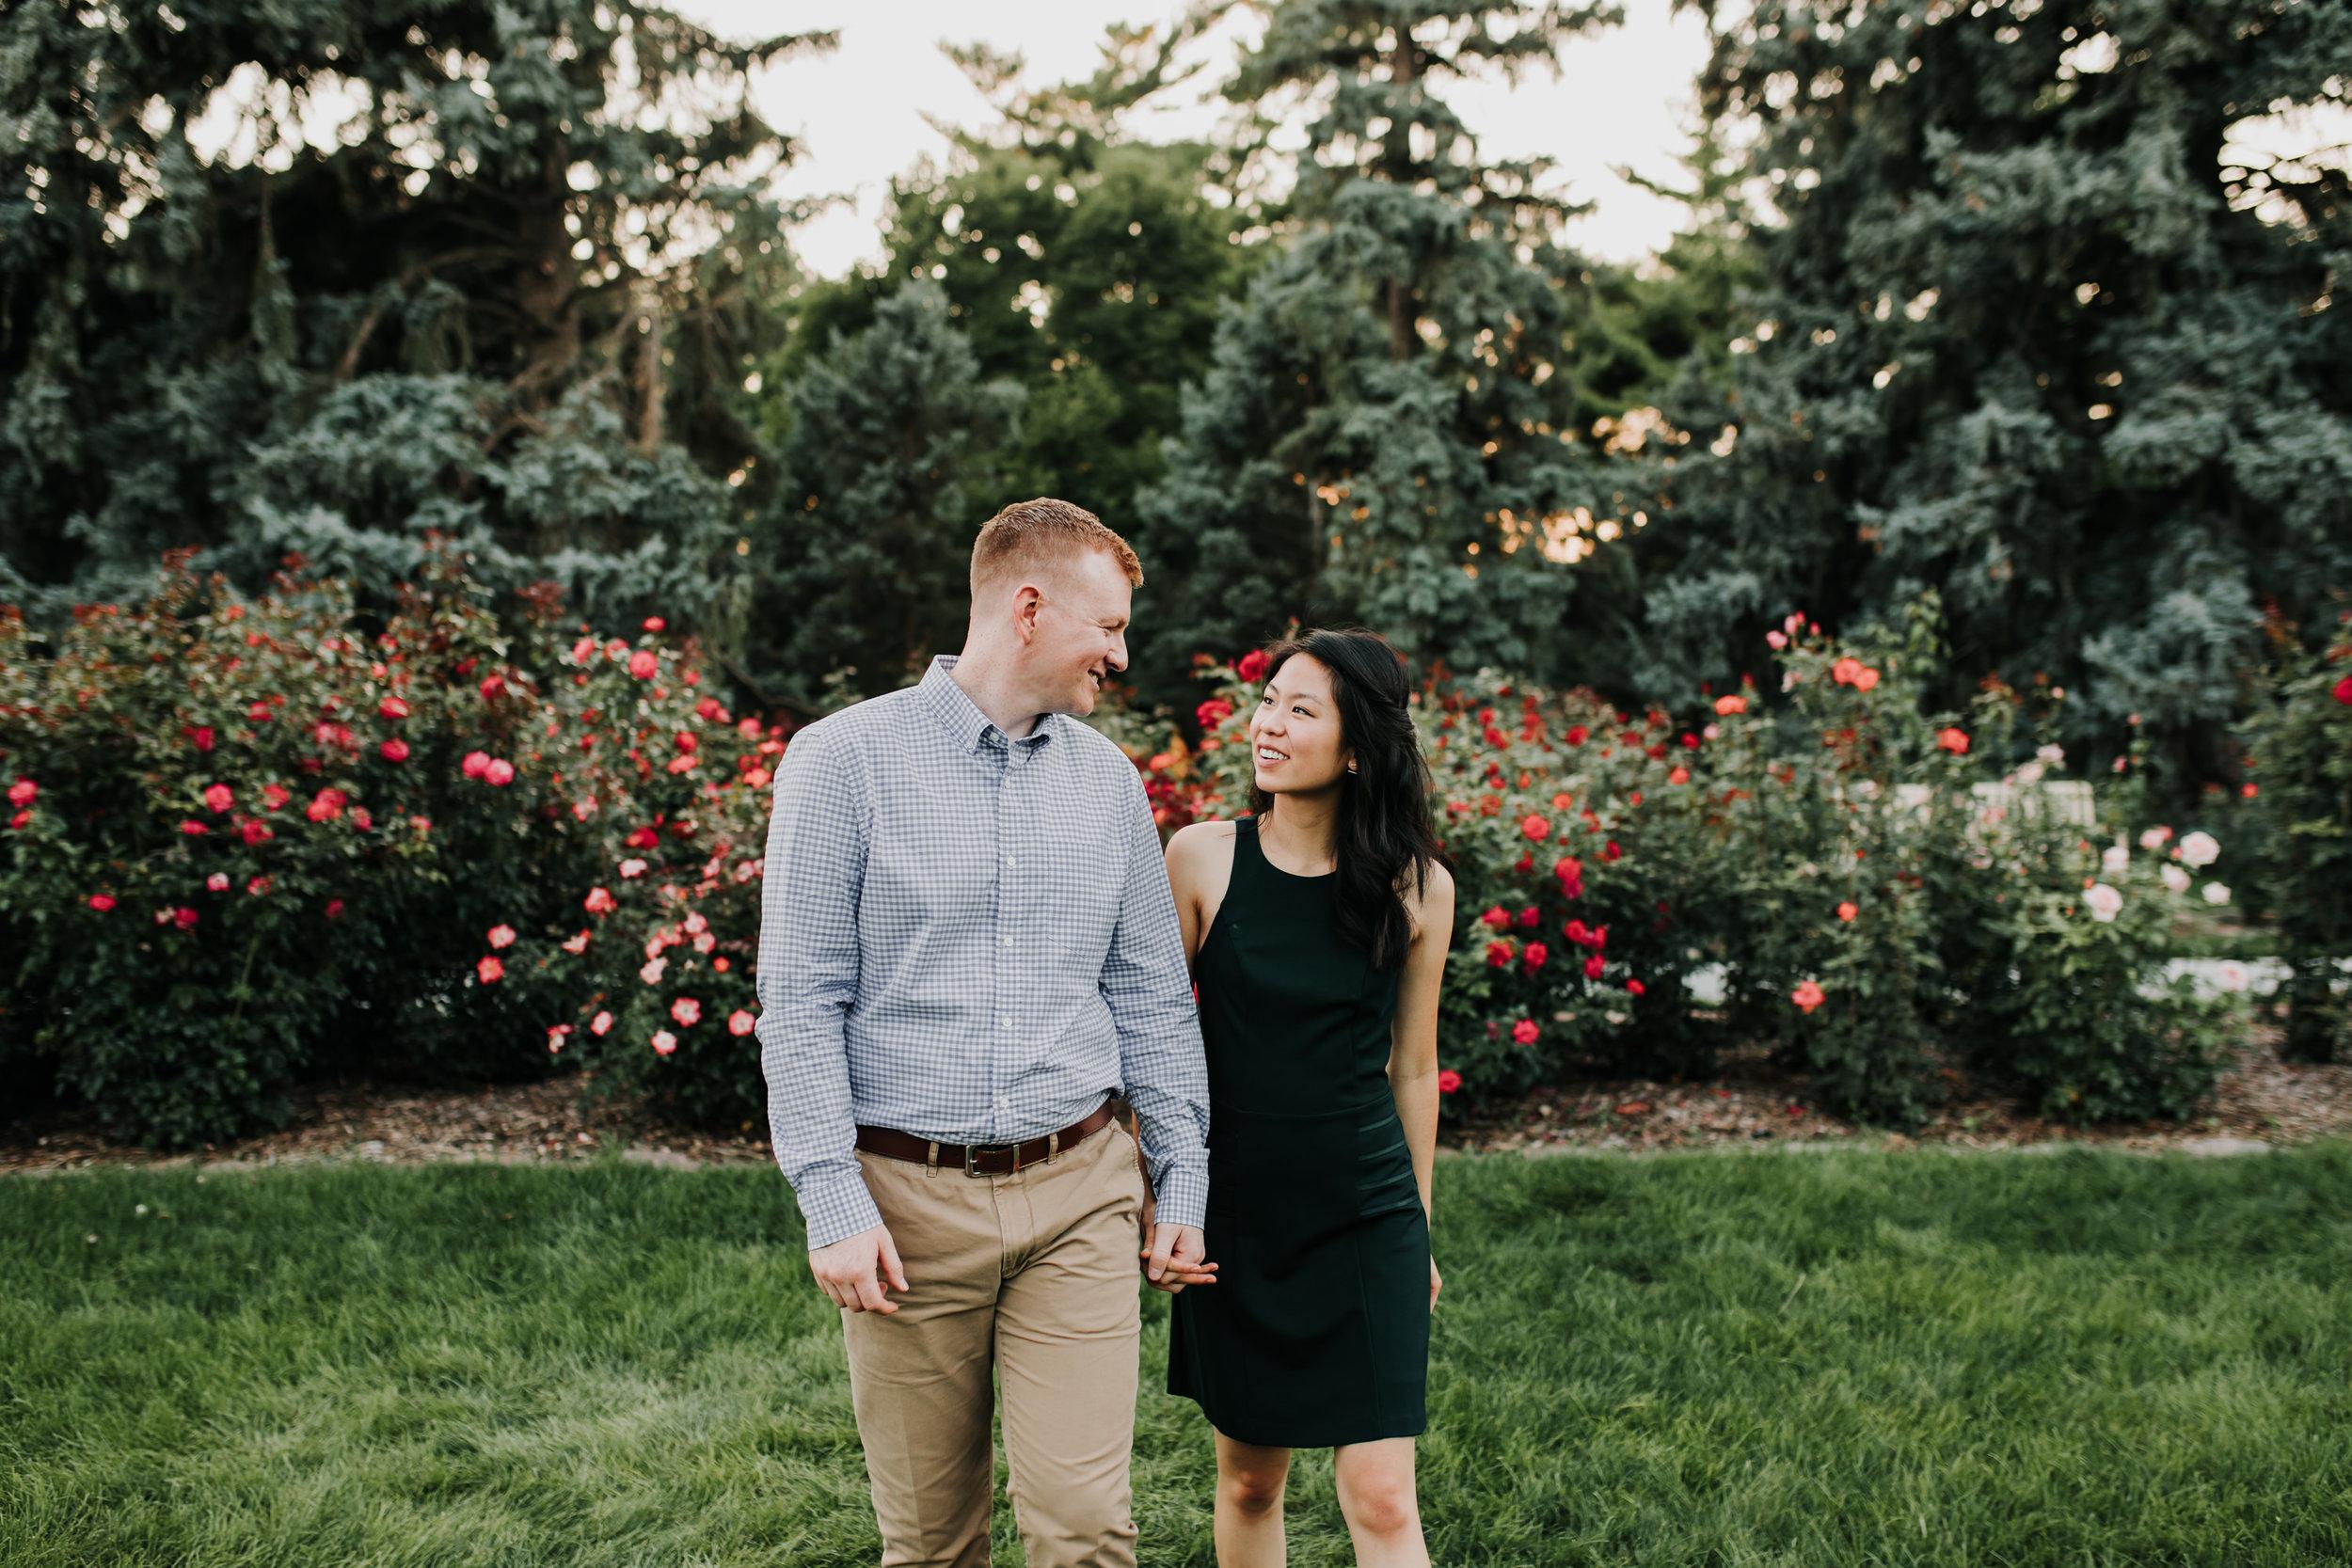 Catherin & Kyle - Married - Nathaniel Jensen Photography - Omaha Nebraska Wedding Photograper - Memorial Park - Joslyn Castle Engagement Session-69.jpg